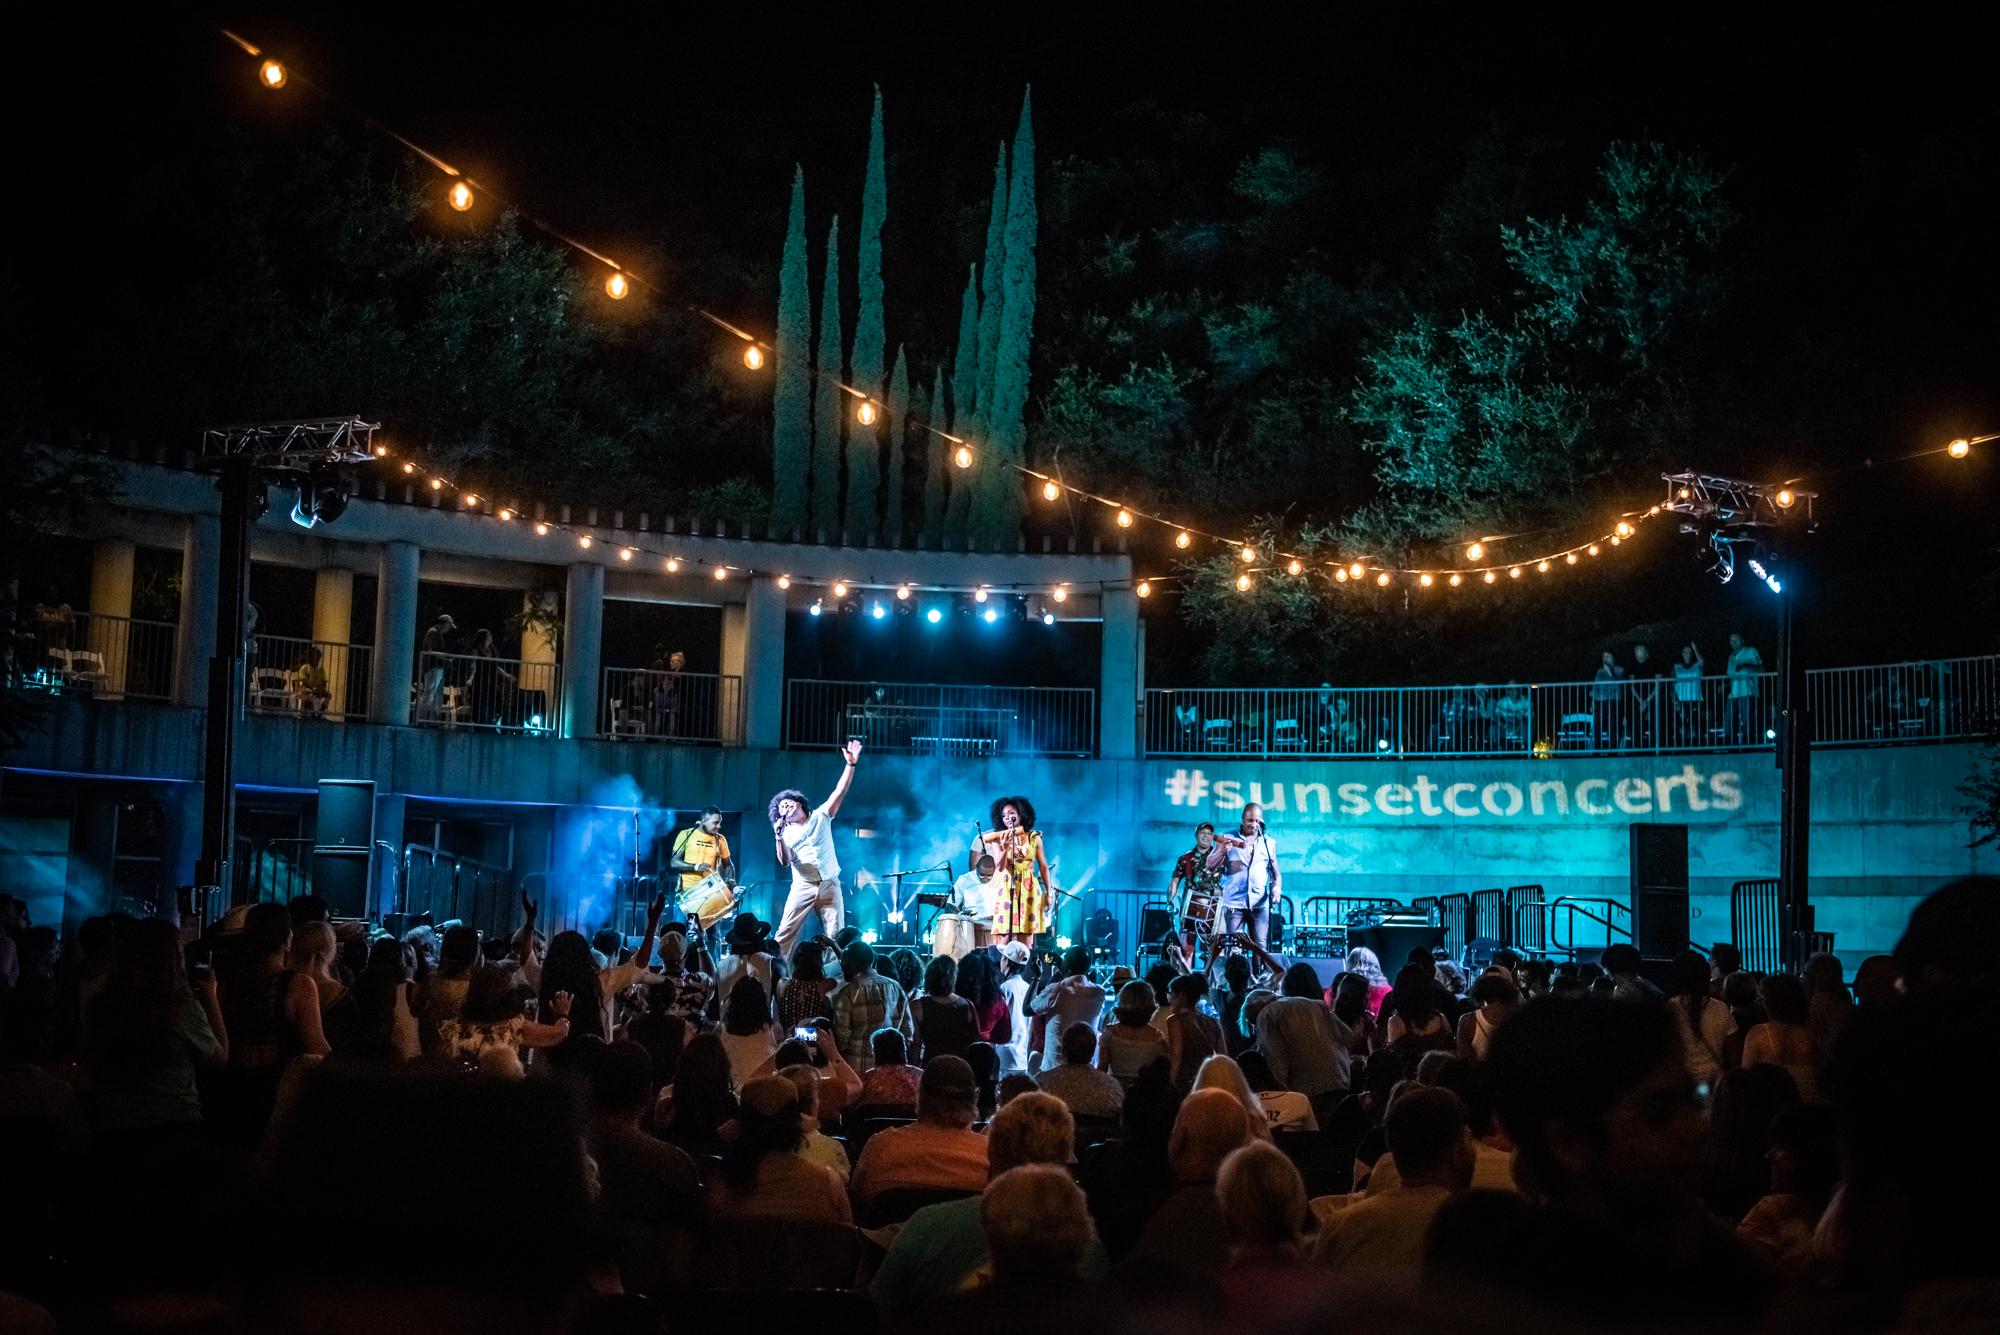 lindsey best Río Mira sunset concert series the skirball cultural center